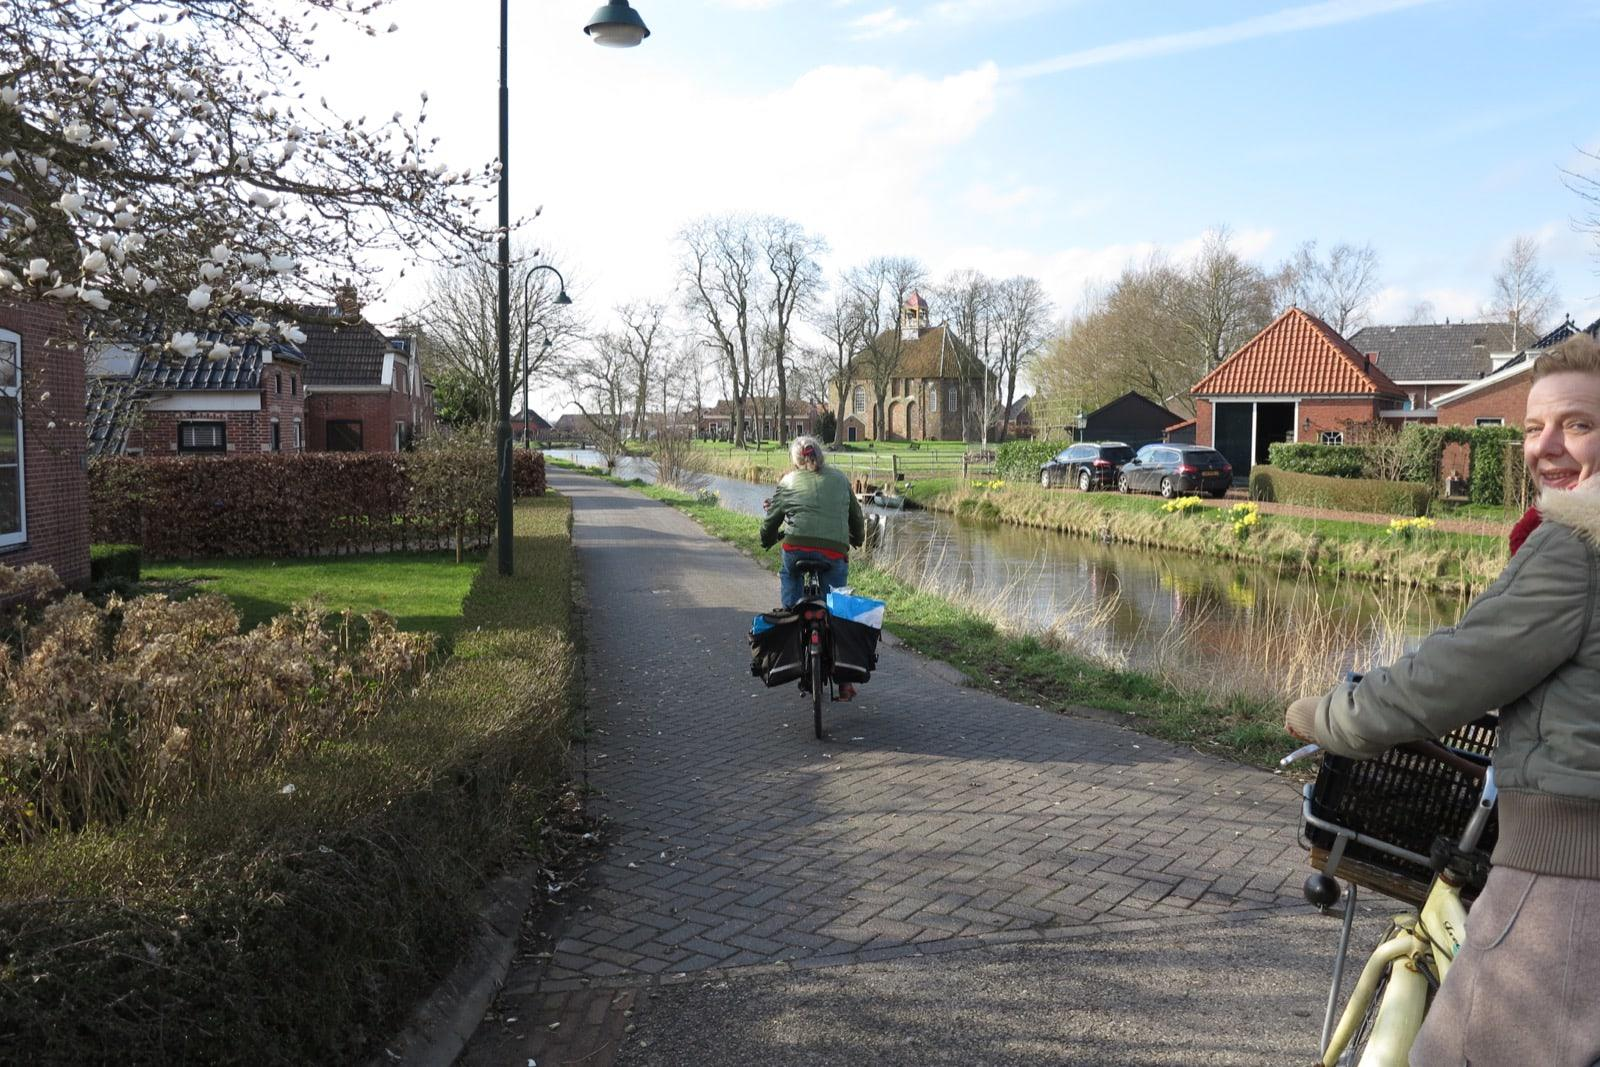 et-fiets-en-fietser-25-angel's-fietstassen-oi.jpg